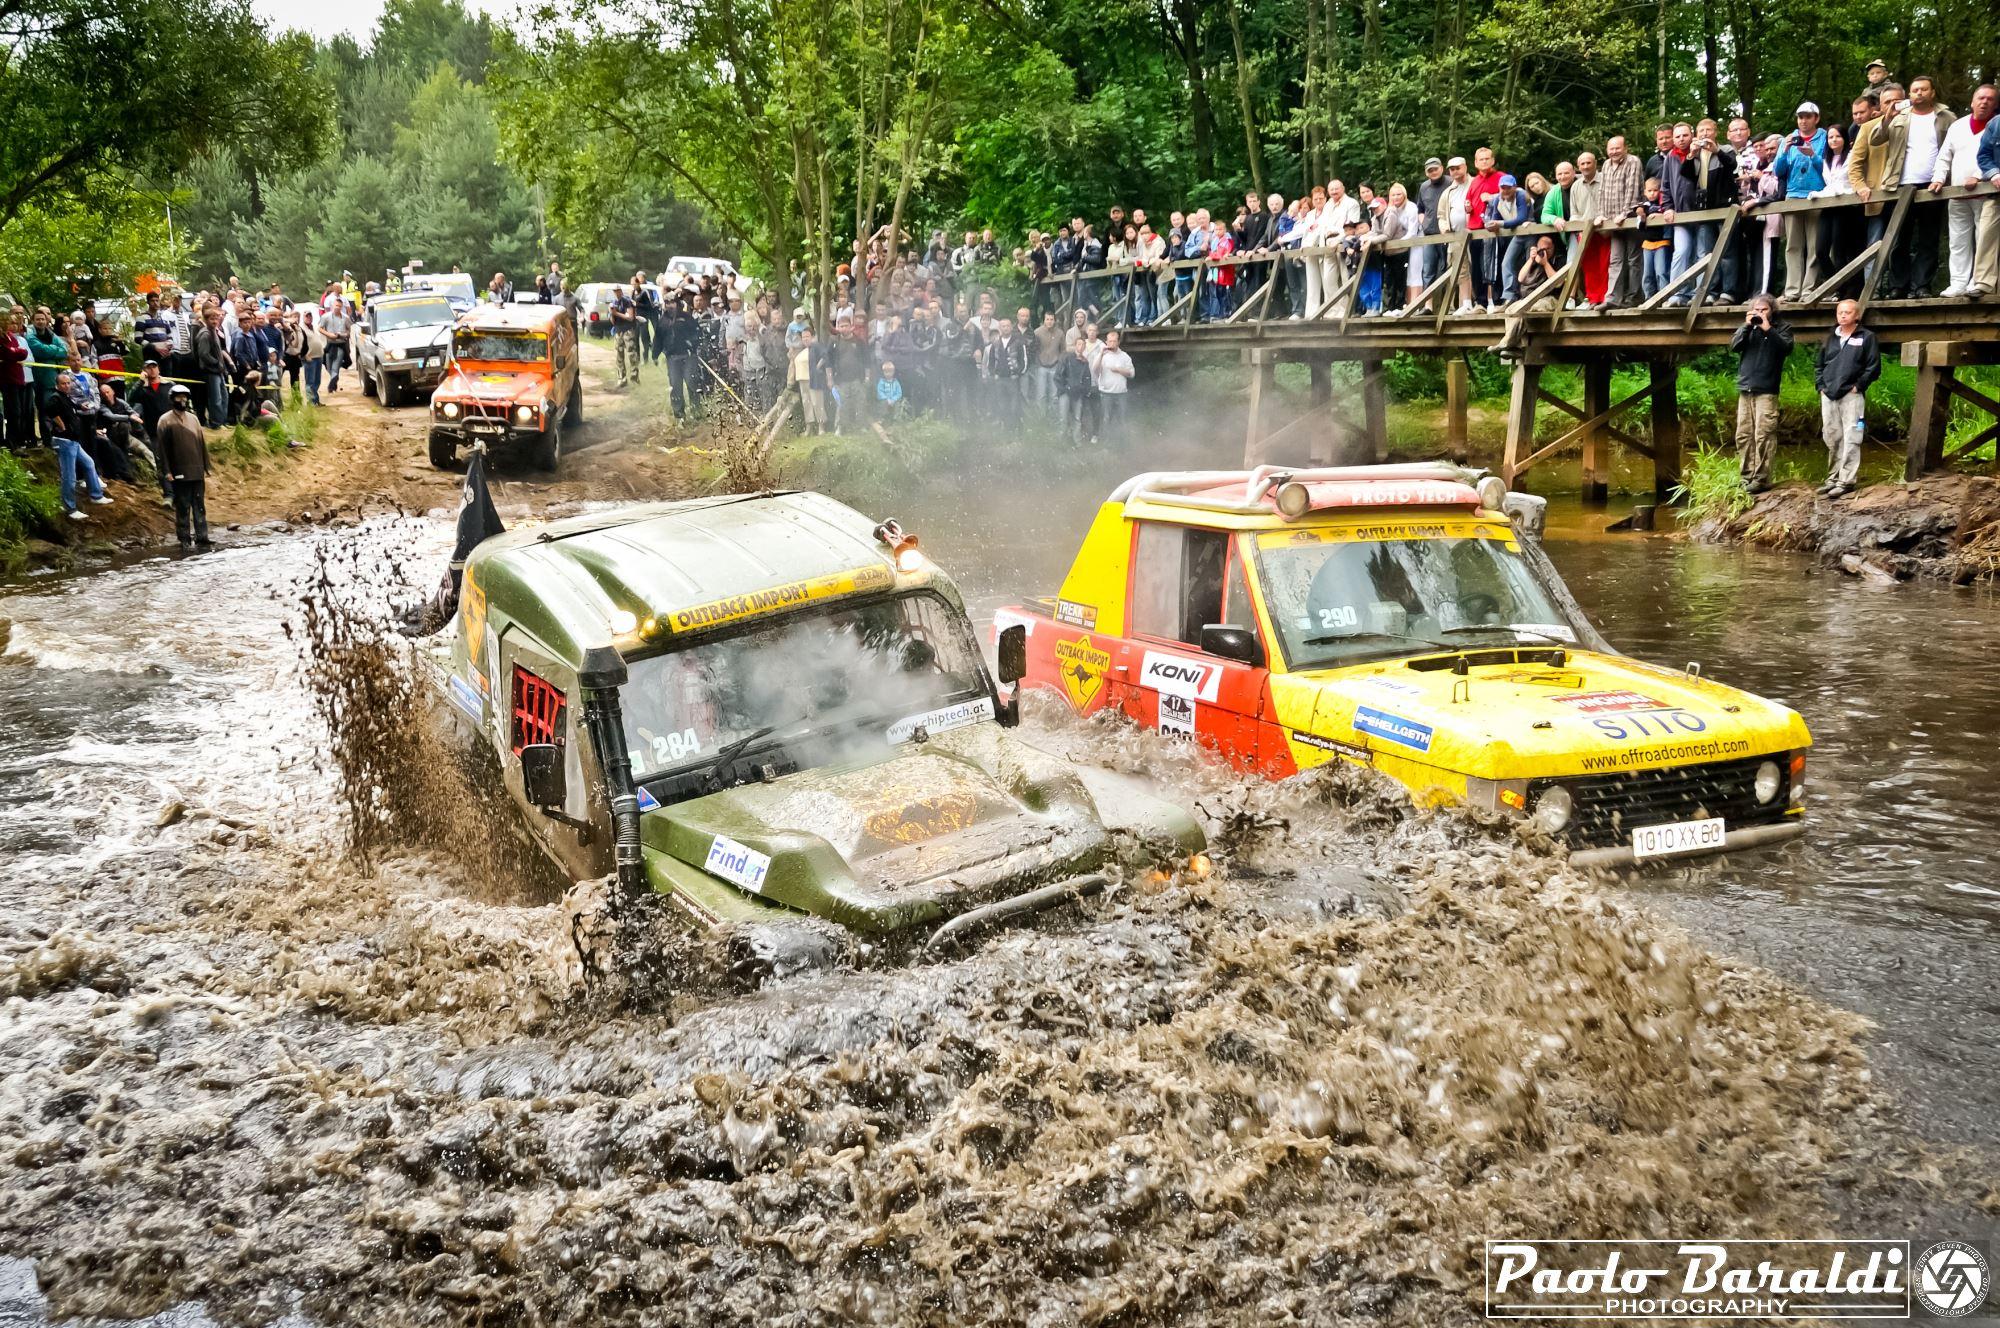 Rallye Breslau: the legend lives on